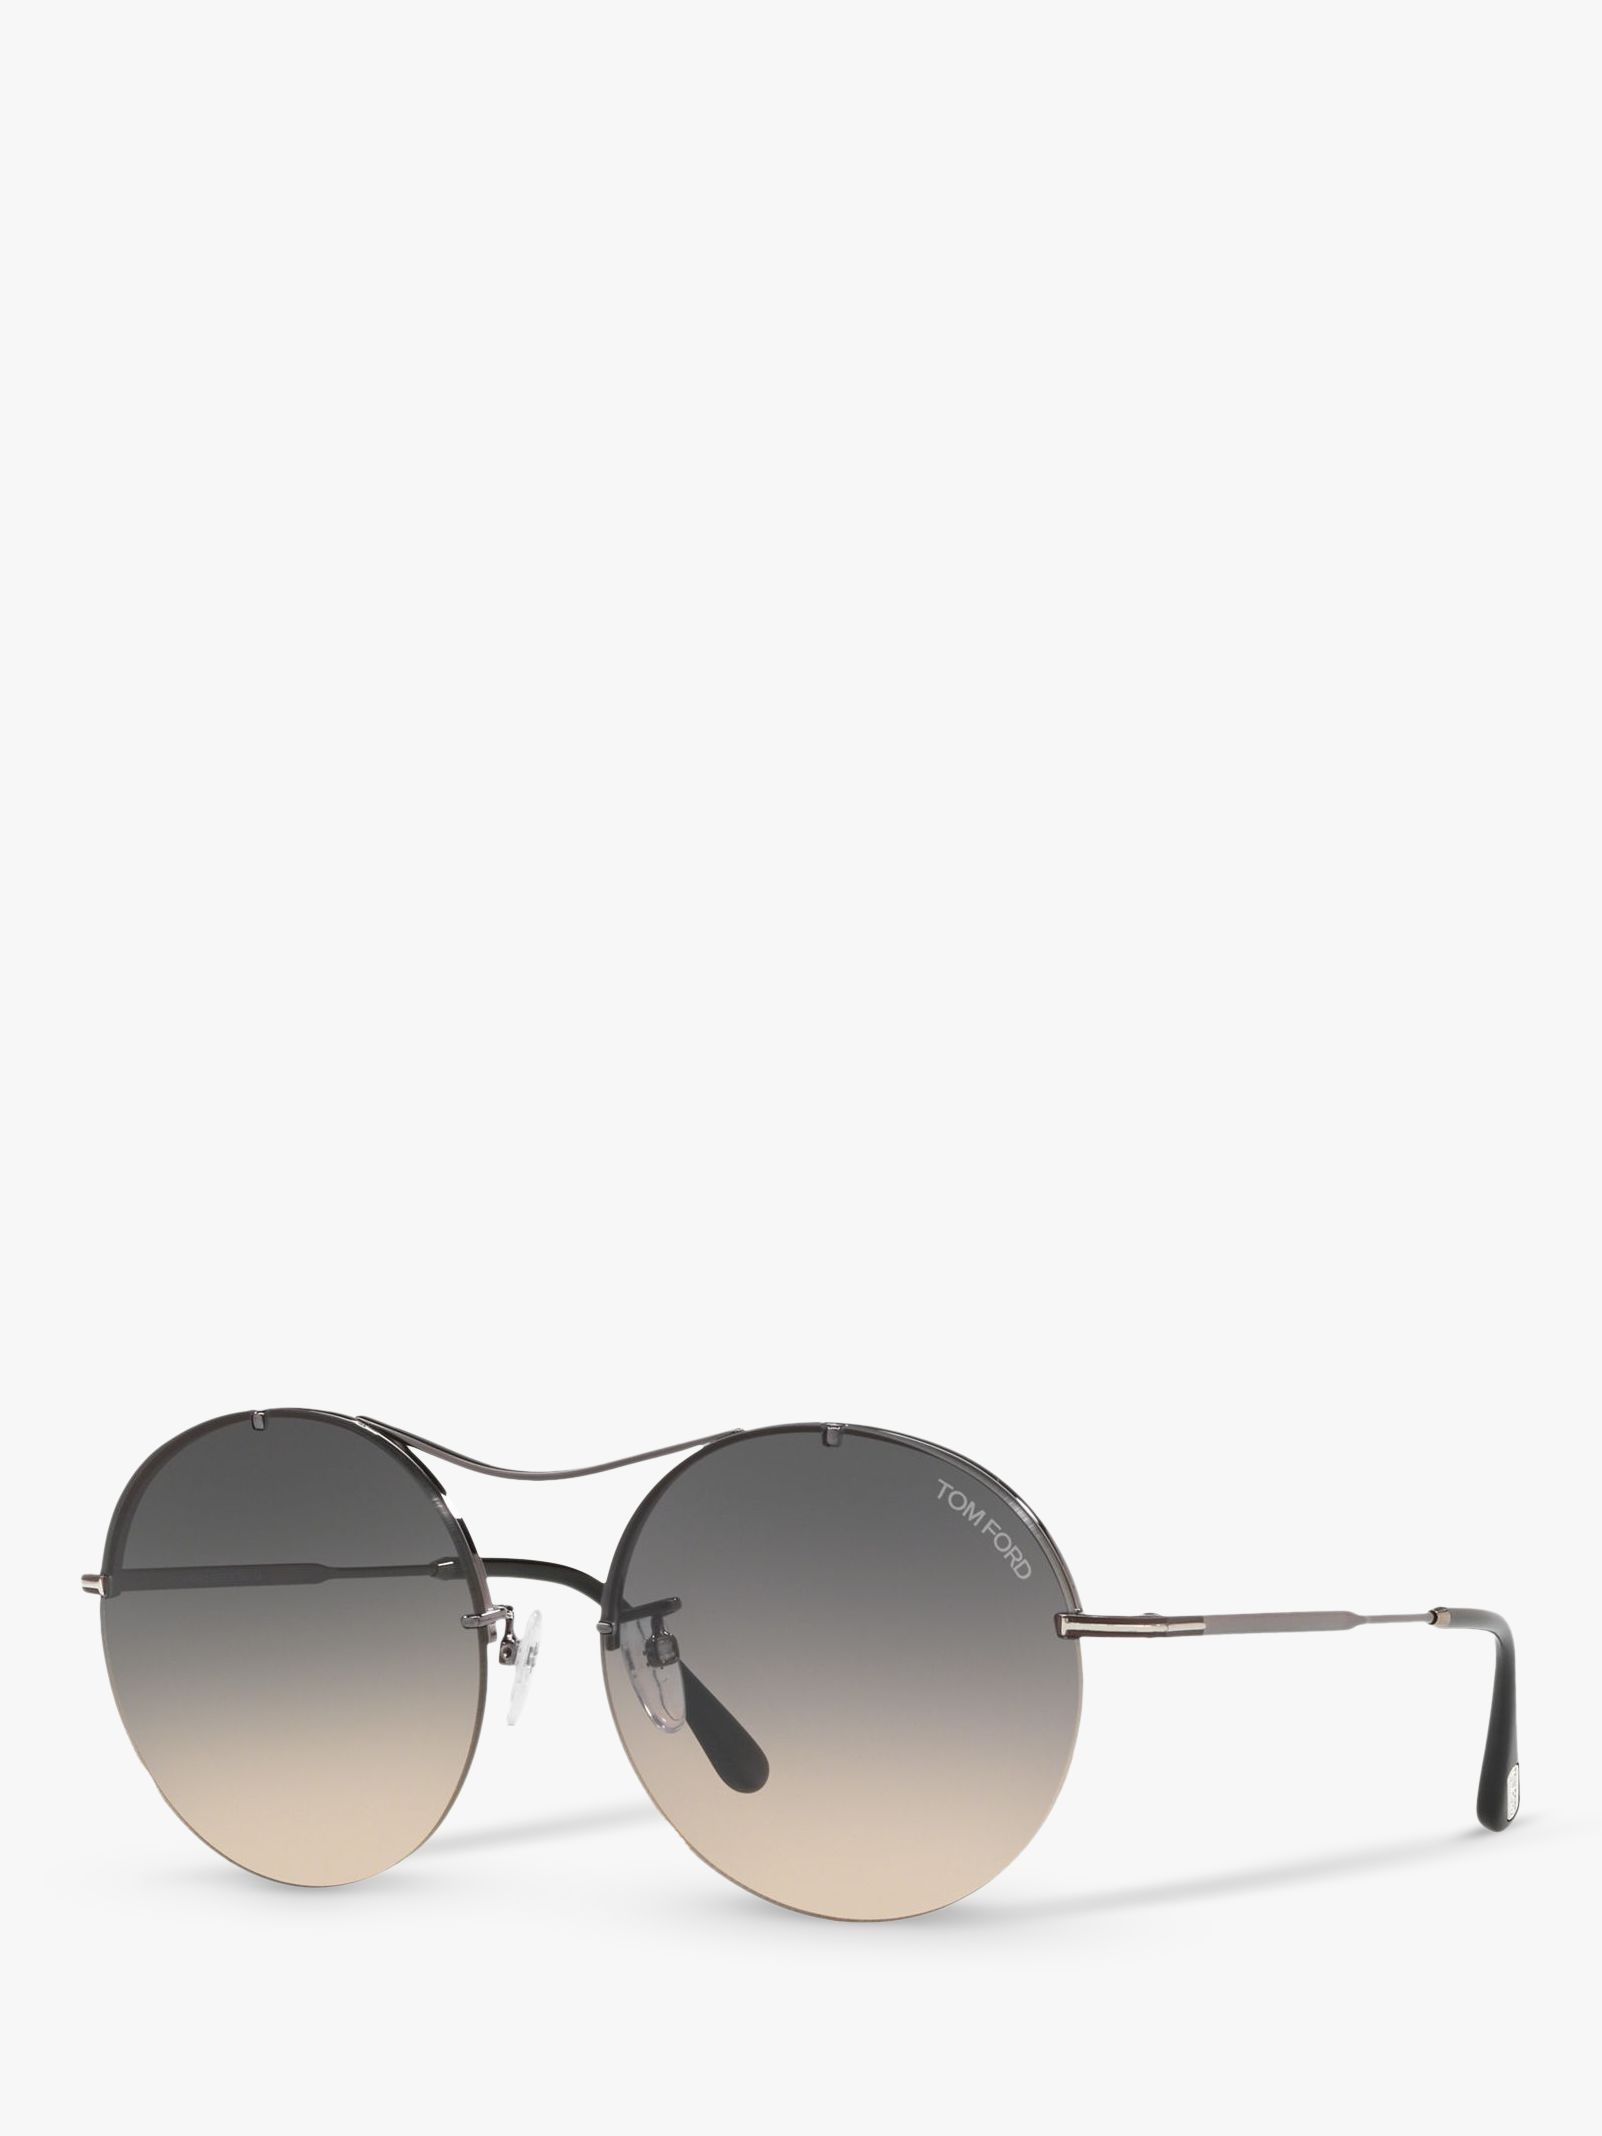 Tom Ford TOM FORD FT0565 Veronique-02 Round Sunglasses